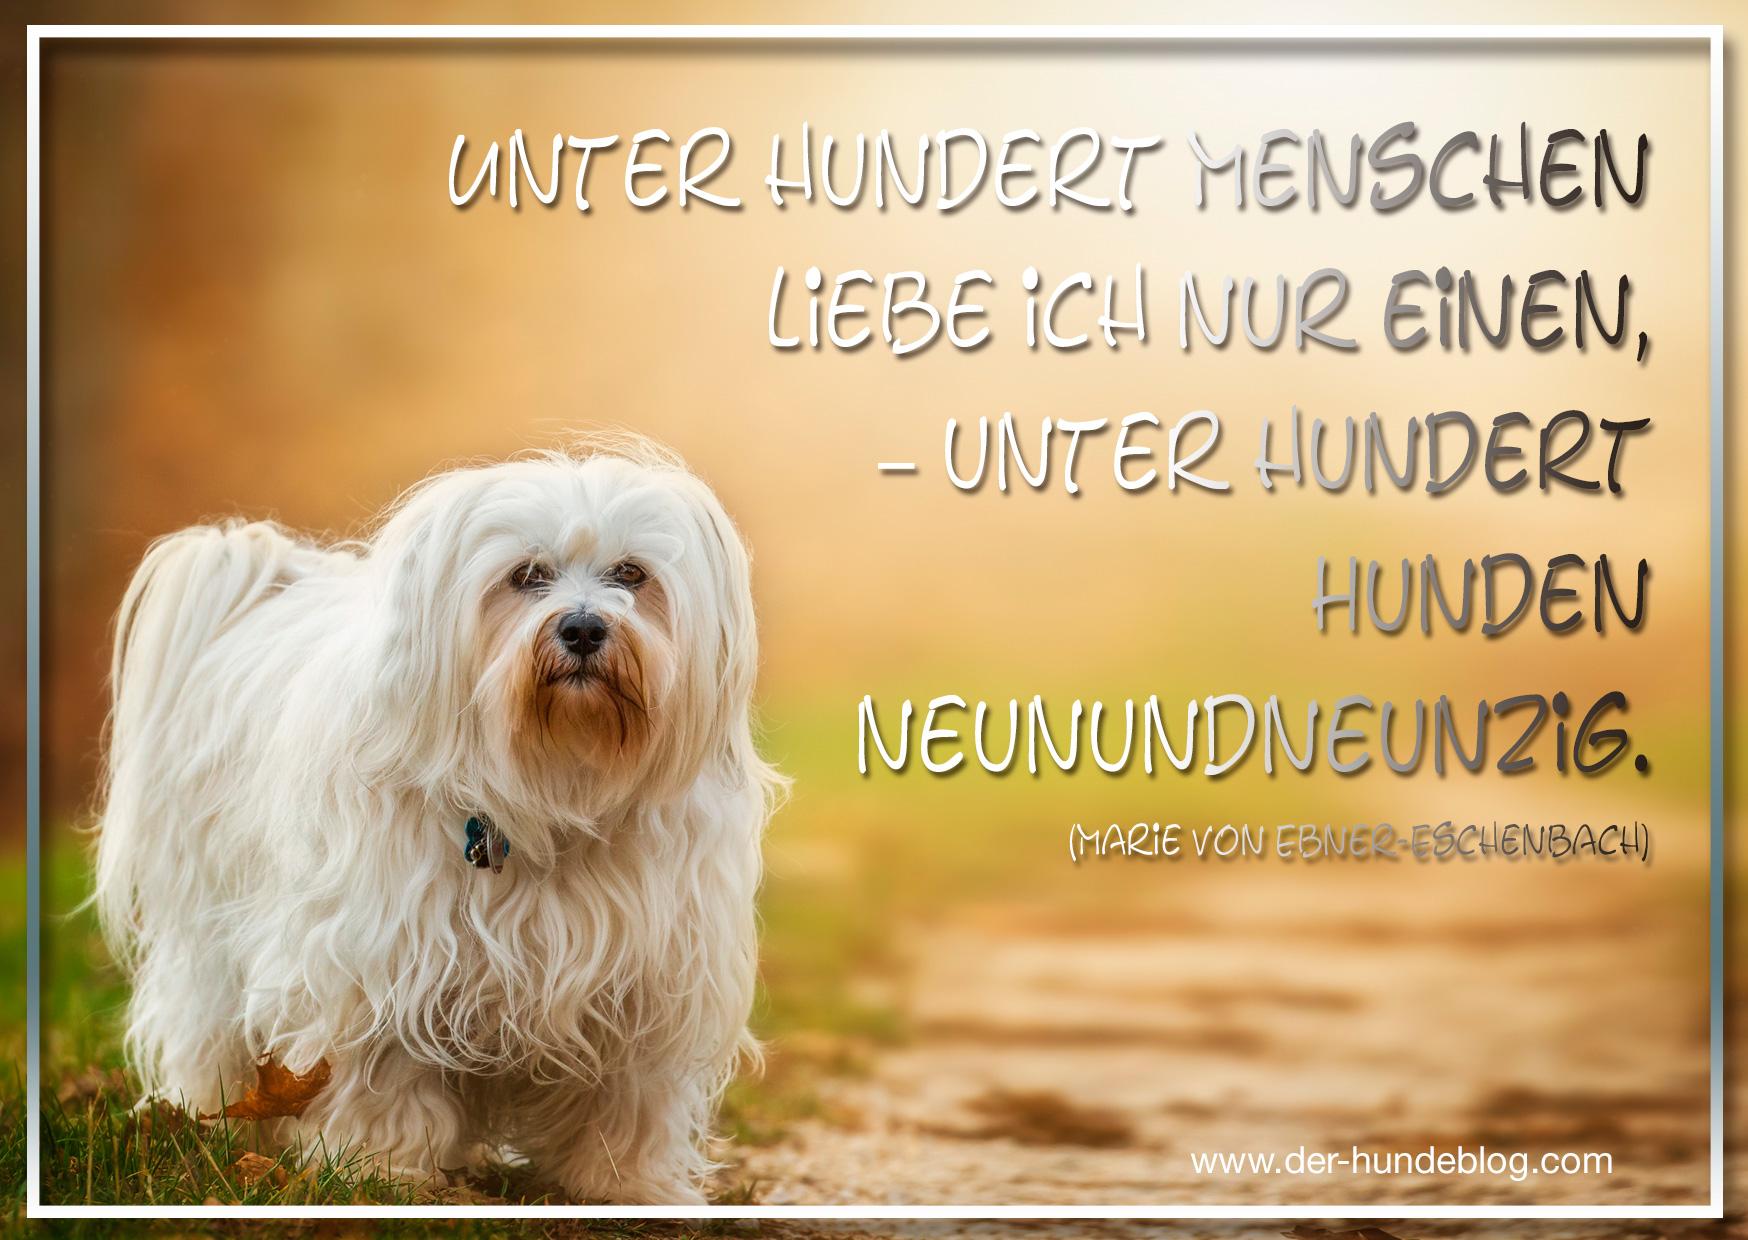 der-hundeblog-schoene-sprueche-hunde-5